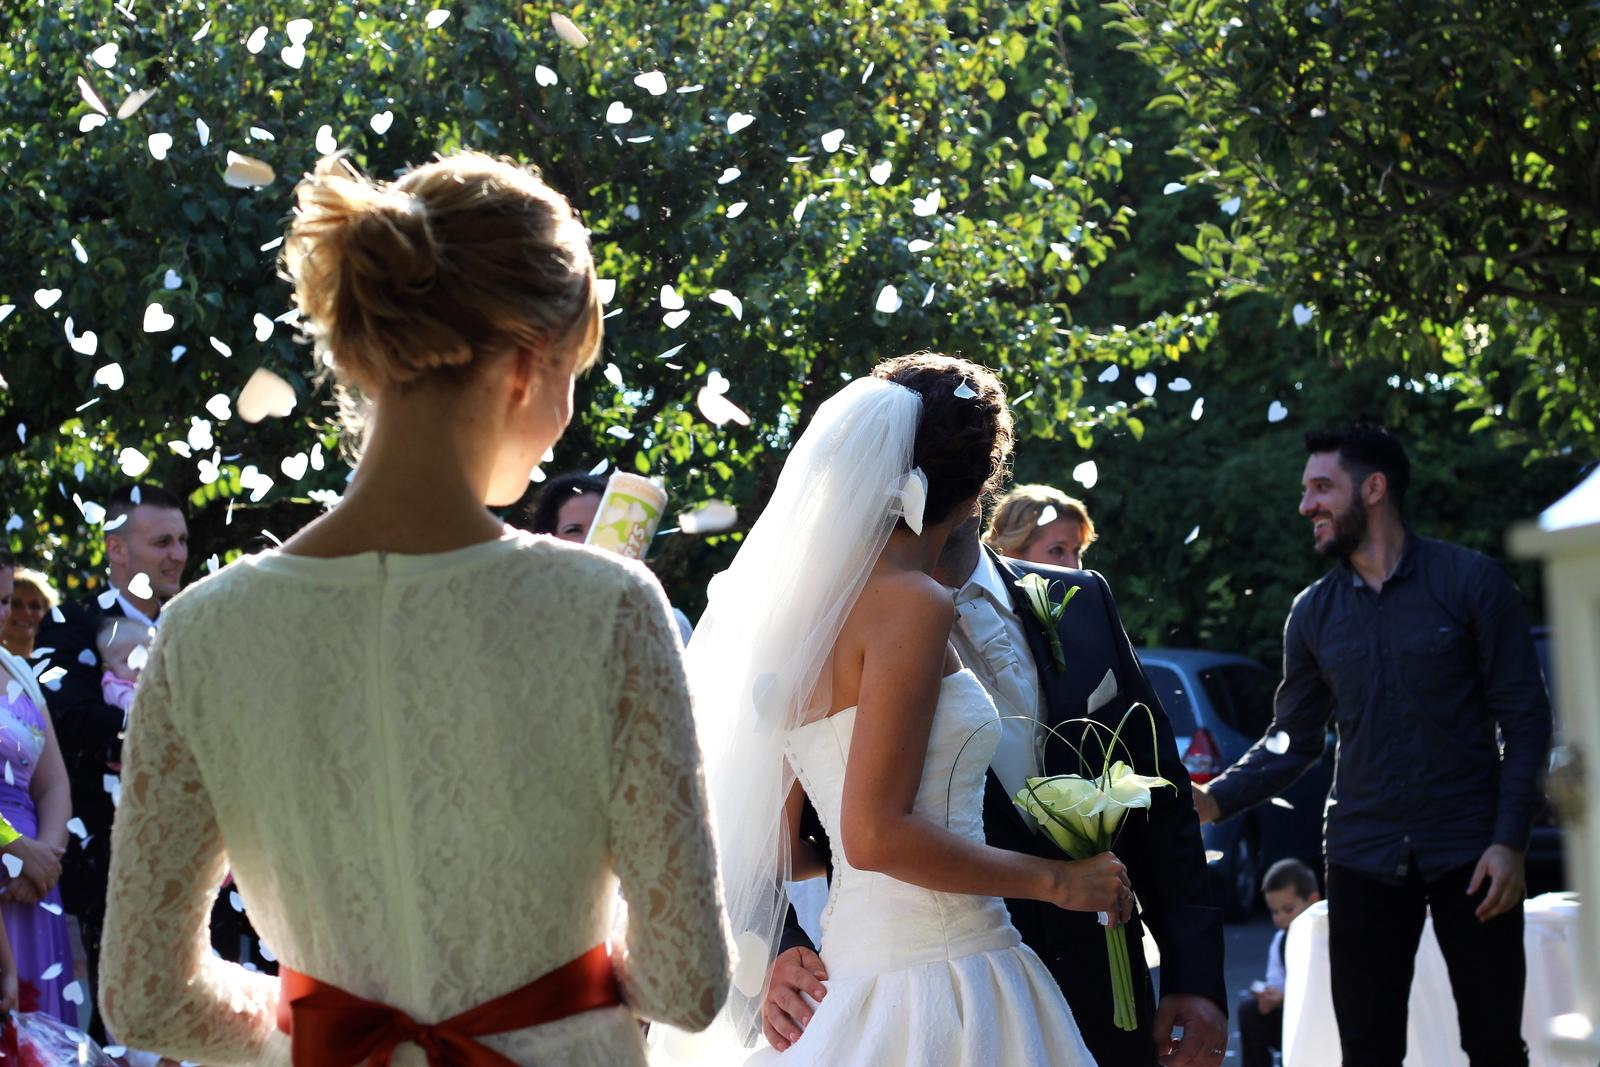 Svadba 2020 - Obrad